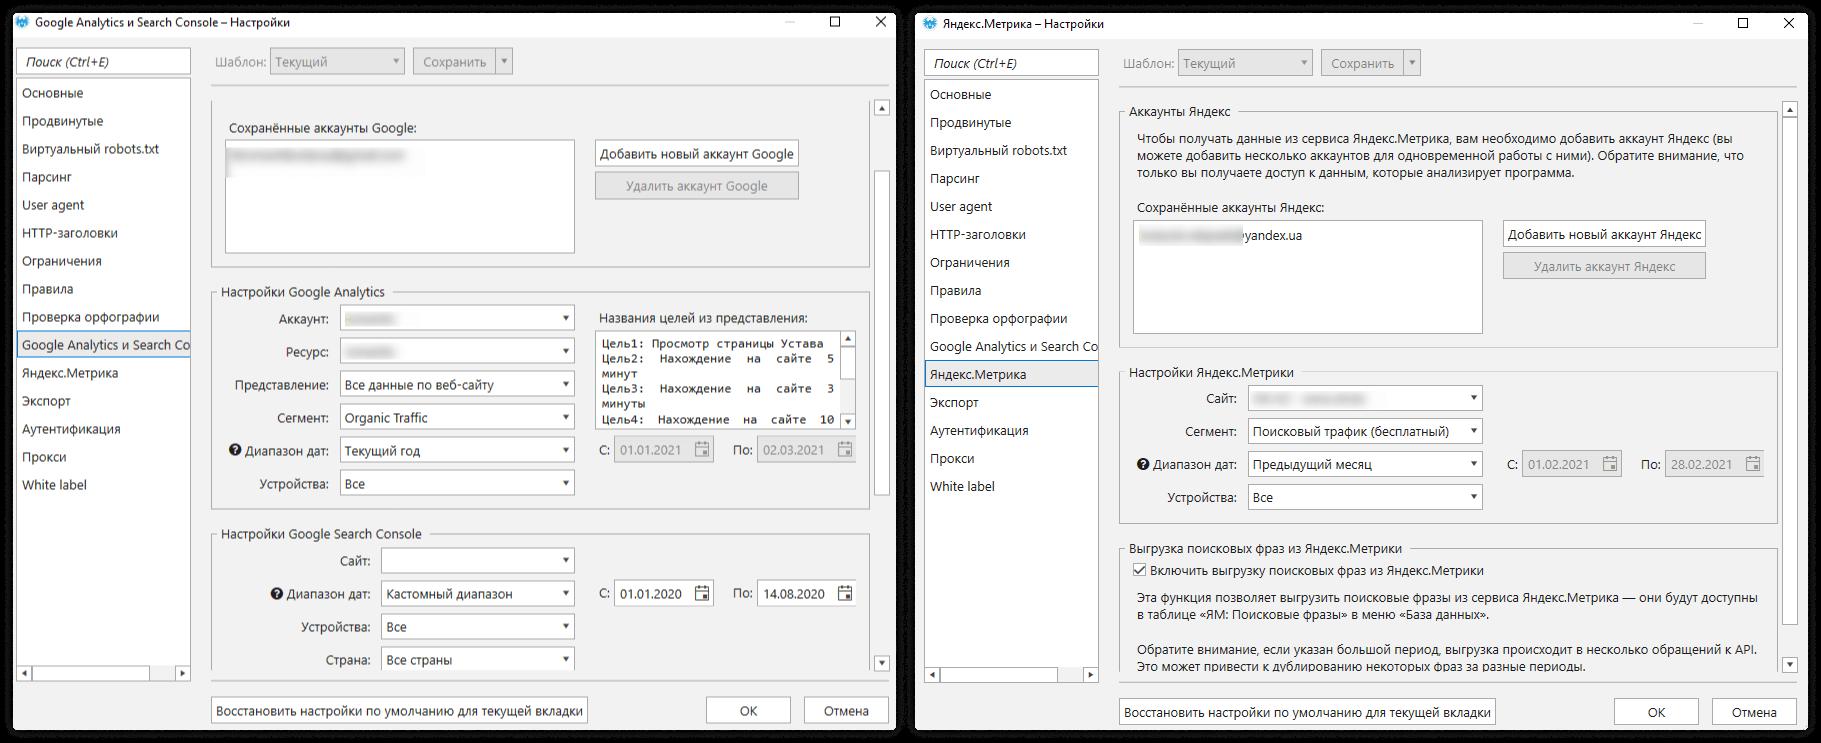 Интеграции с Google Analytics, Google Search Console и Яндекс.Метрикой в Netpeak Spider